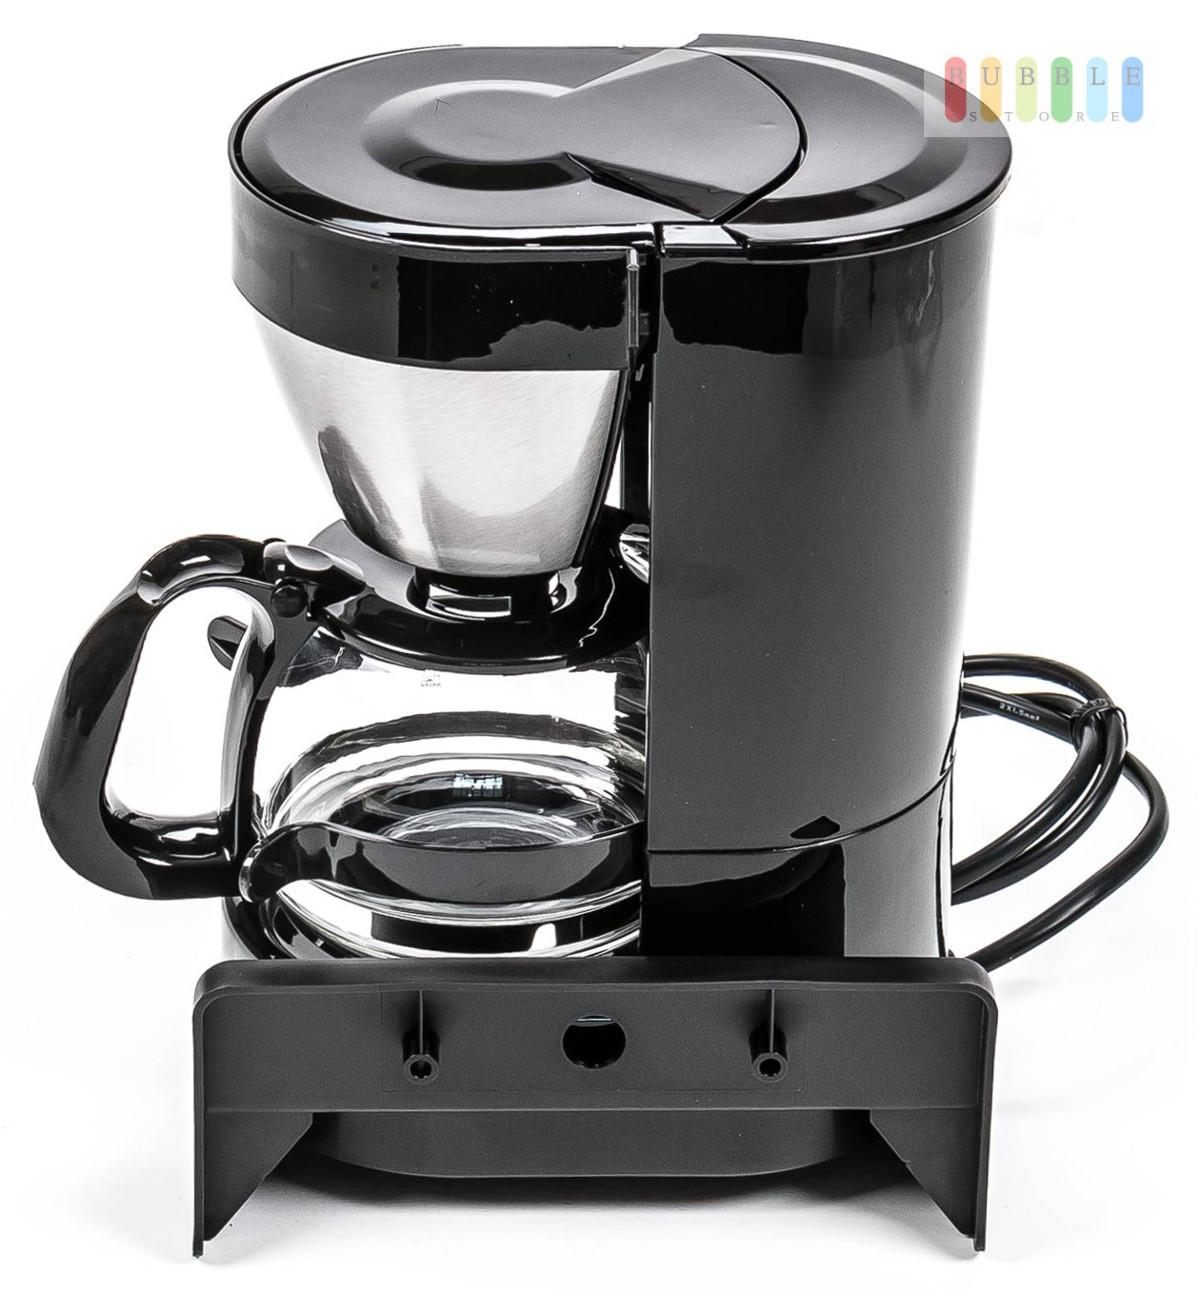 kaffeemaschine kaffee 5 tassen kfz auto camping caravan wohnwagen 12v 170w neu ebay. Black Bedroom Furniture Sets. Home Design Ideas